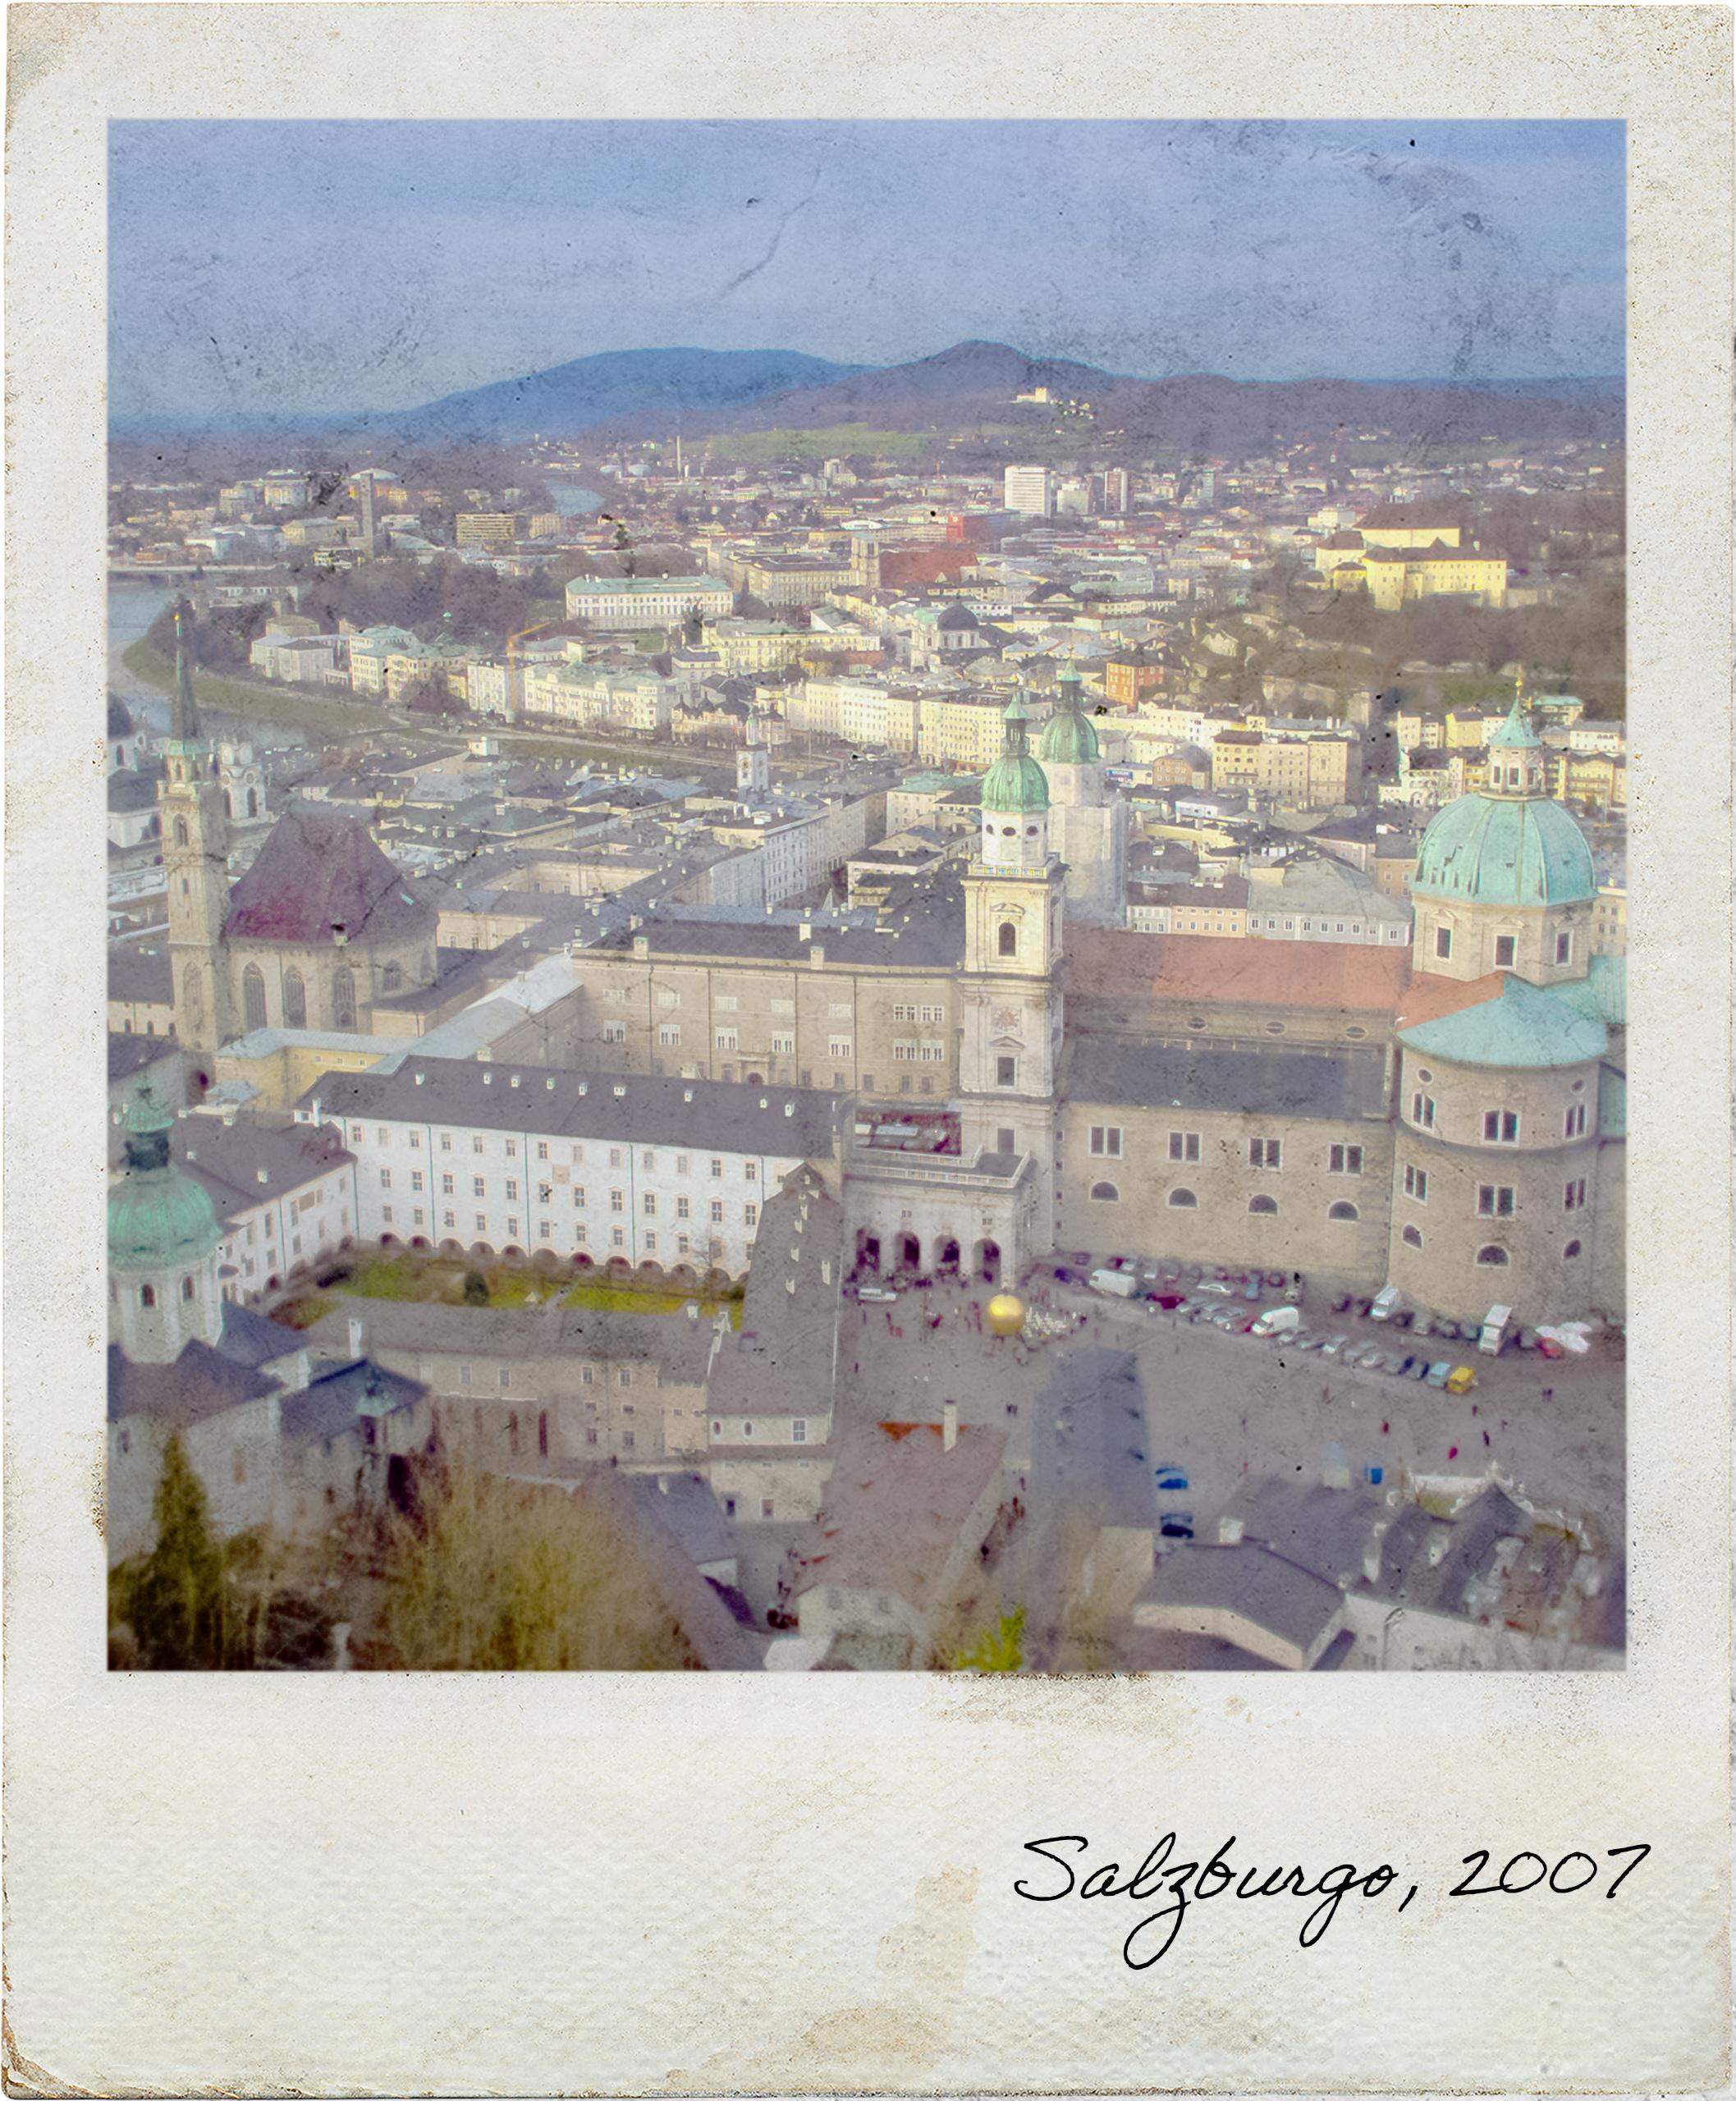 Centro de Salzburgo